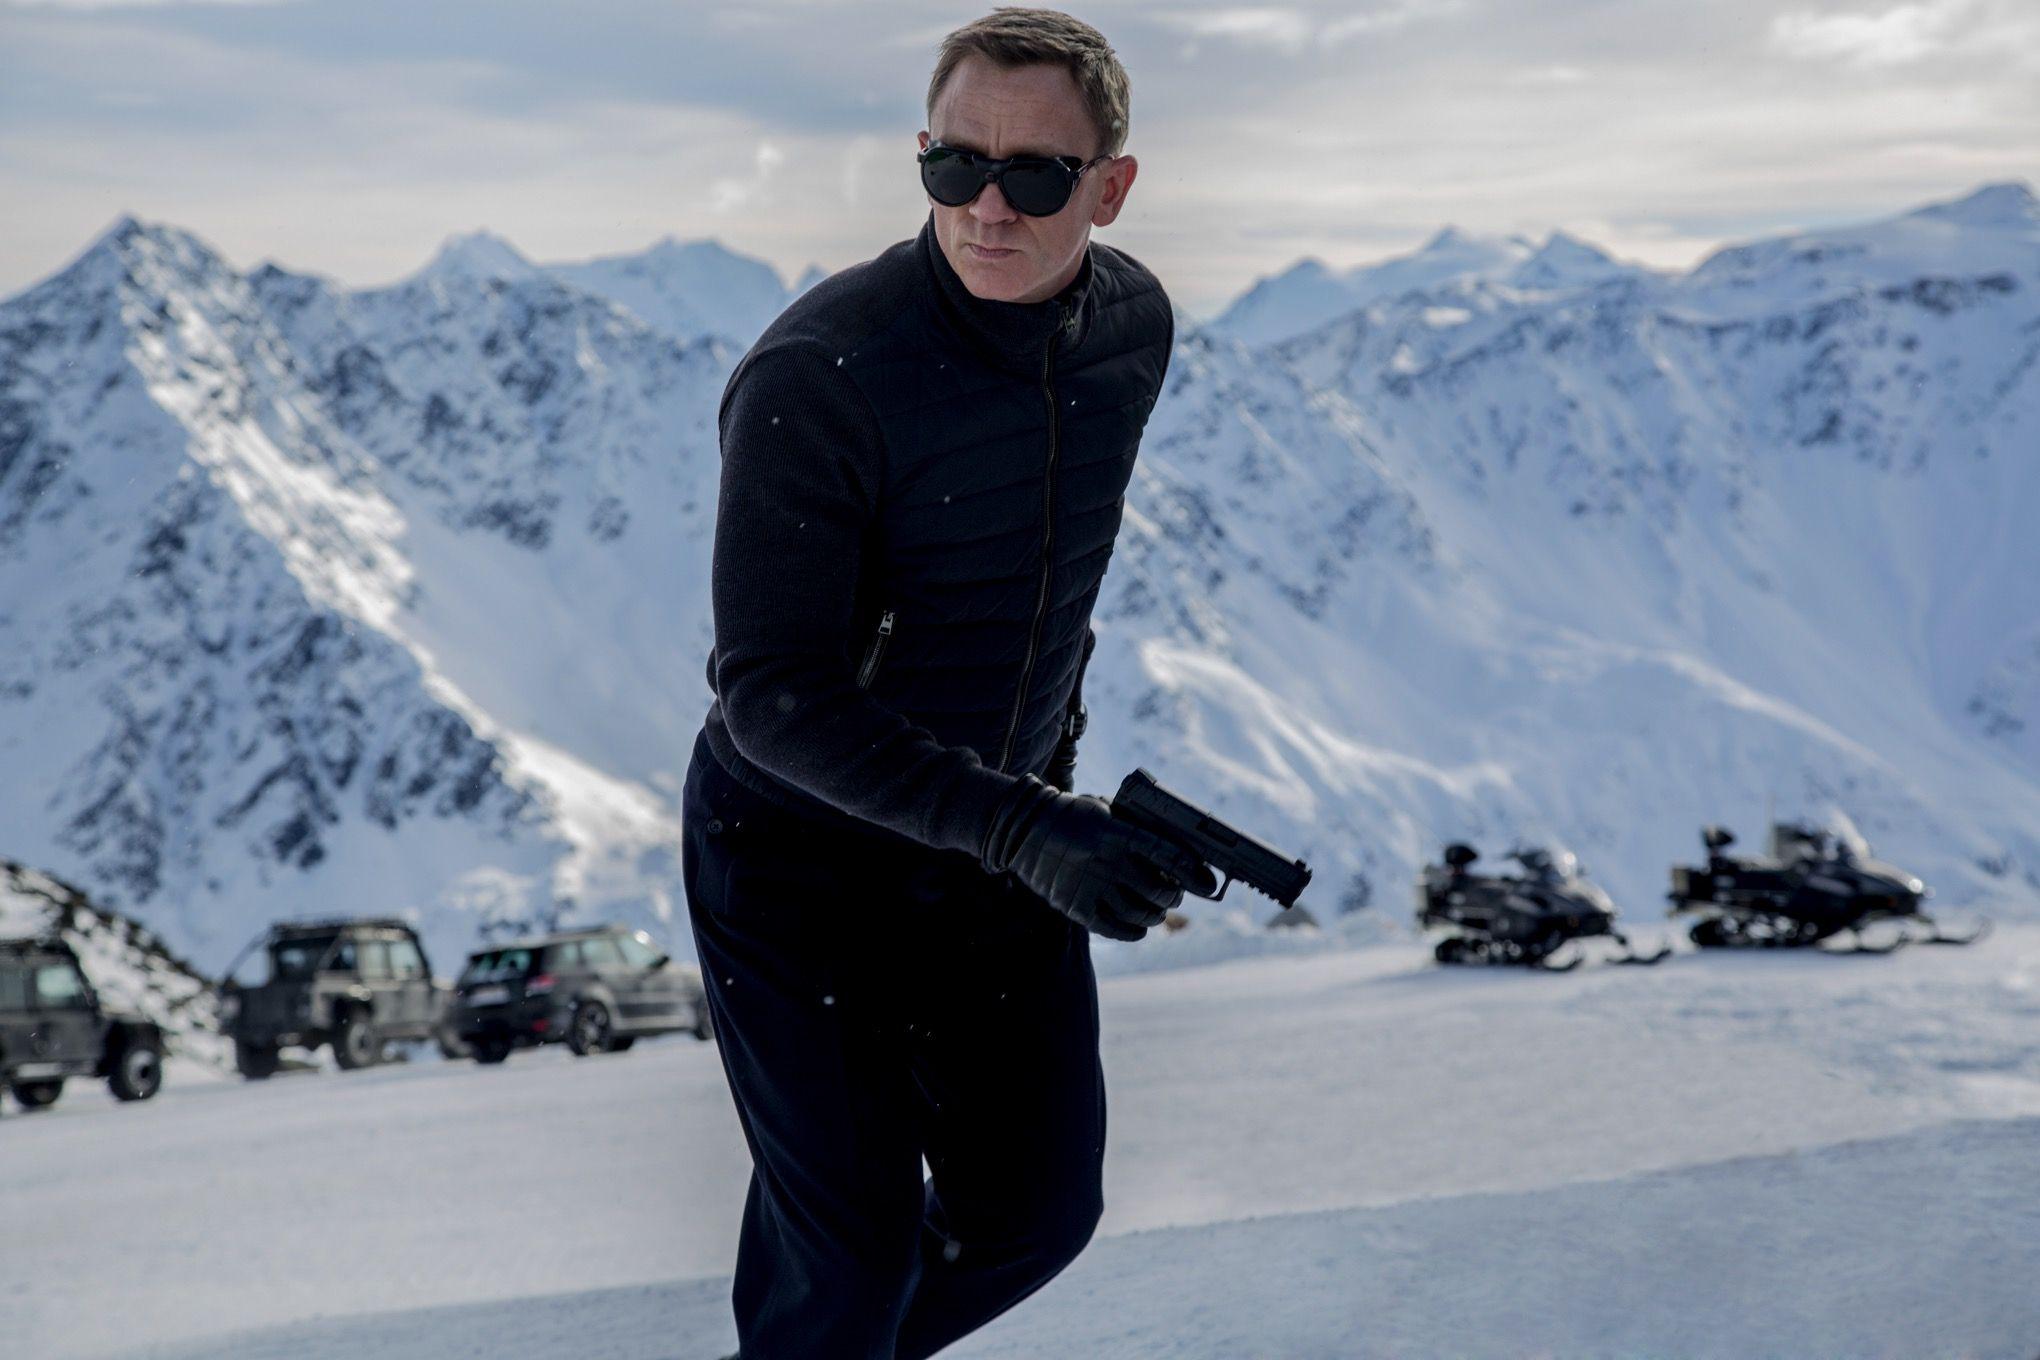 Daniel-Craig-as-James-Bond-in-Spectre-wearing-vintage-Vaurnet-Sunglasses